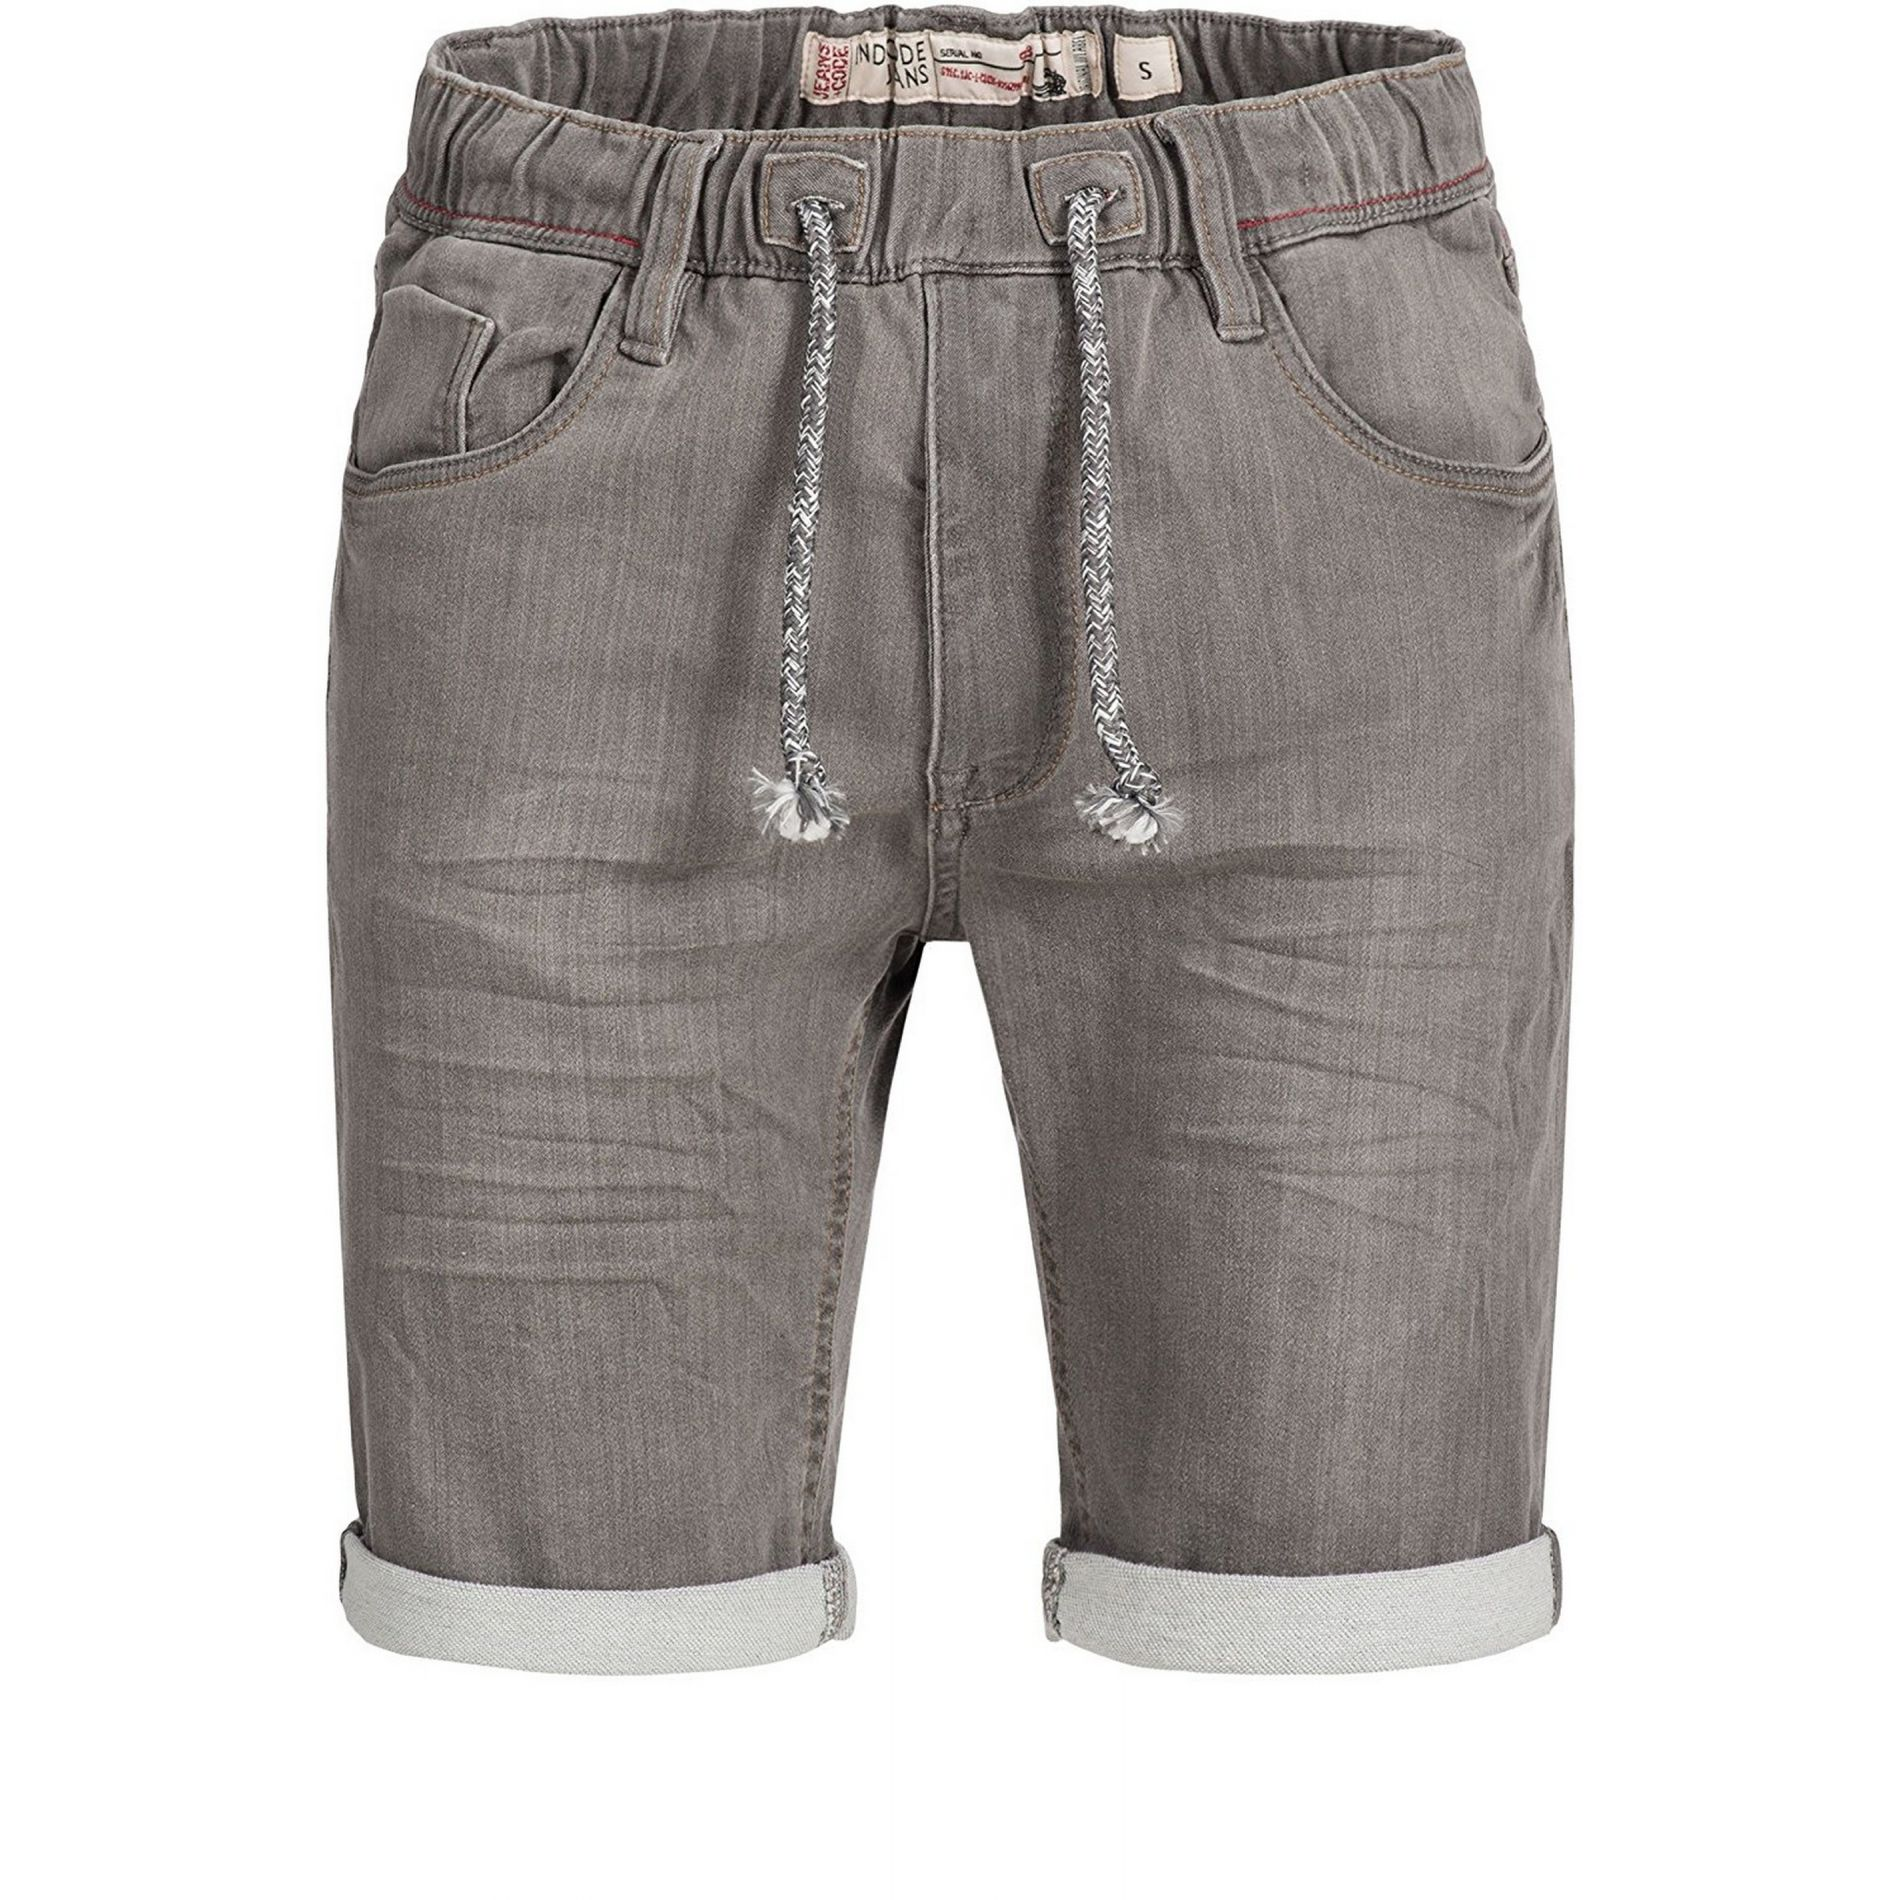 cd55f314dd Kadin Indicode Short En Jeans Gris Fumé Stretch -Kadin Indicode ...